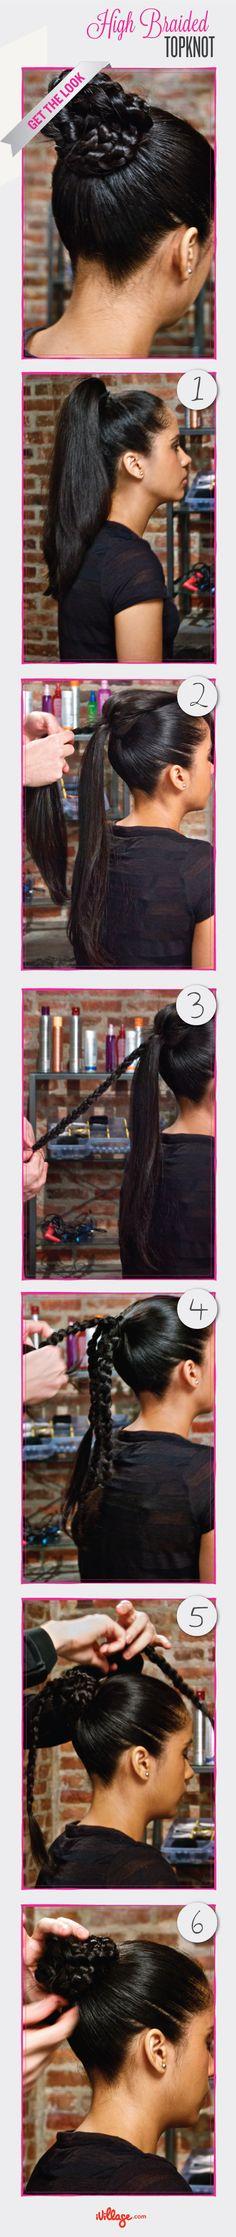 High Braided Topknot Tutorial  #hairstyles #DIY http://www.ivillage.com/diy-high-braided-topknot-0/5-h-480115